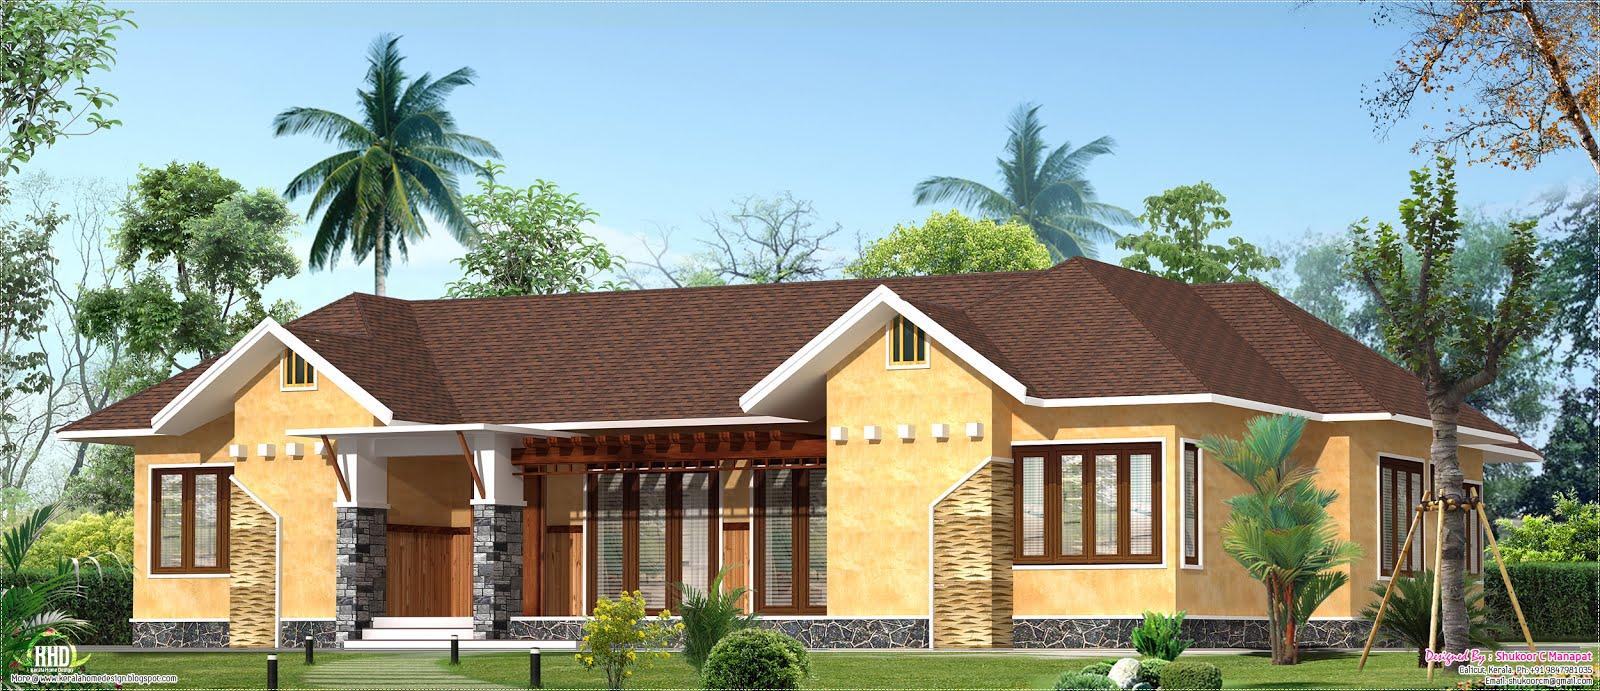 Eco Friendly Home Design India   Awesome Home